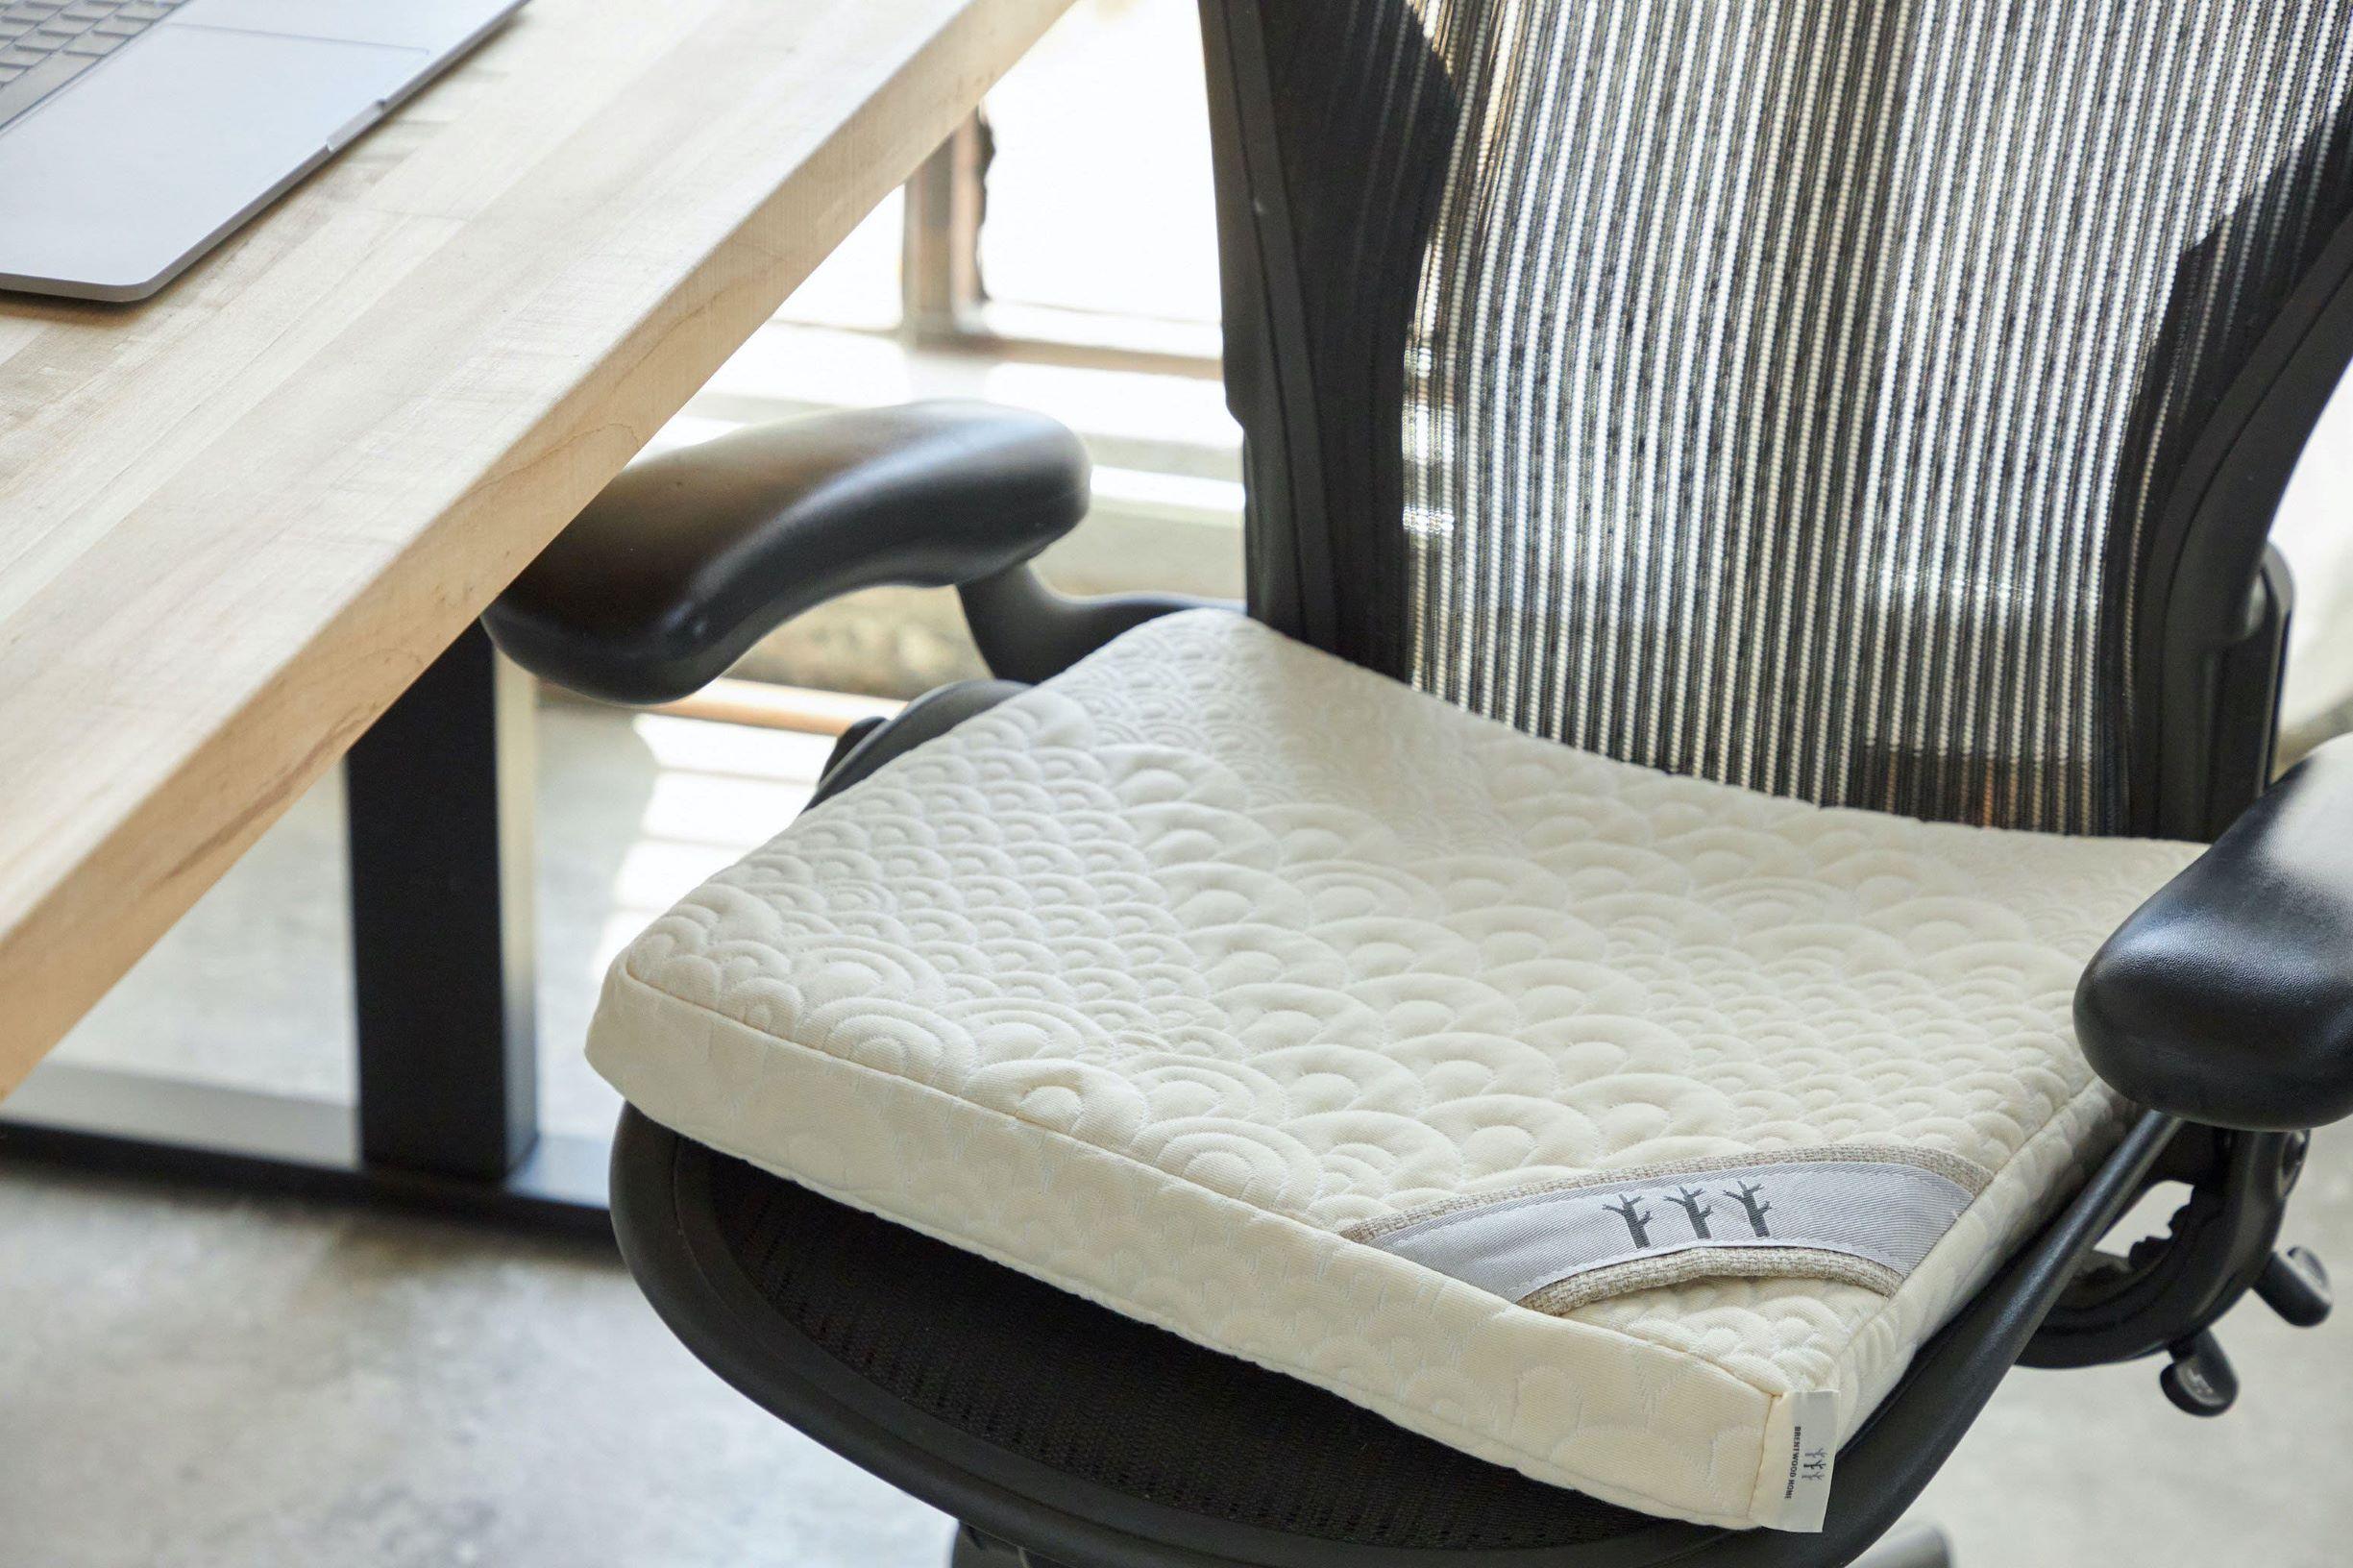 certified organic seat cushion